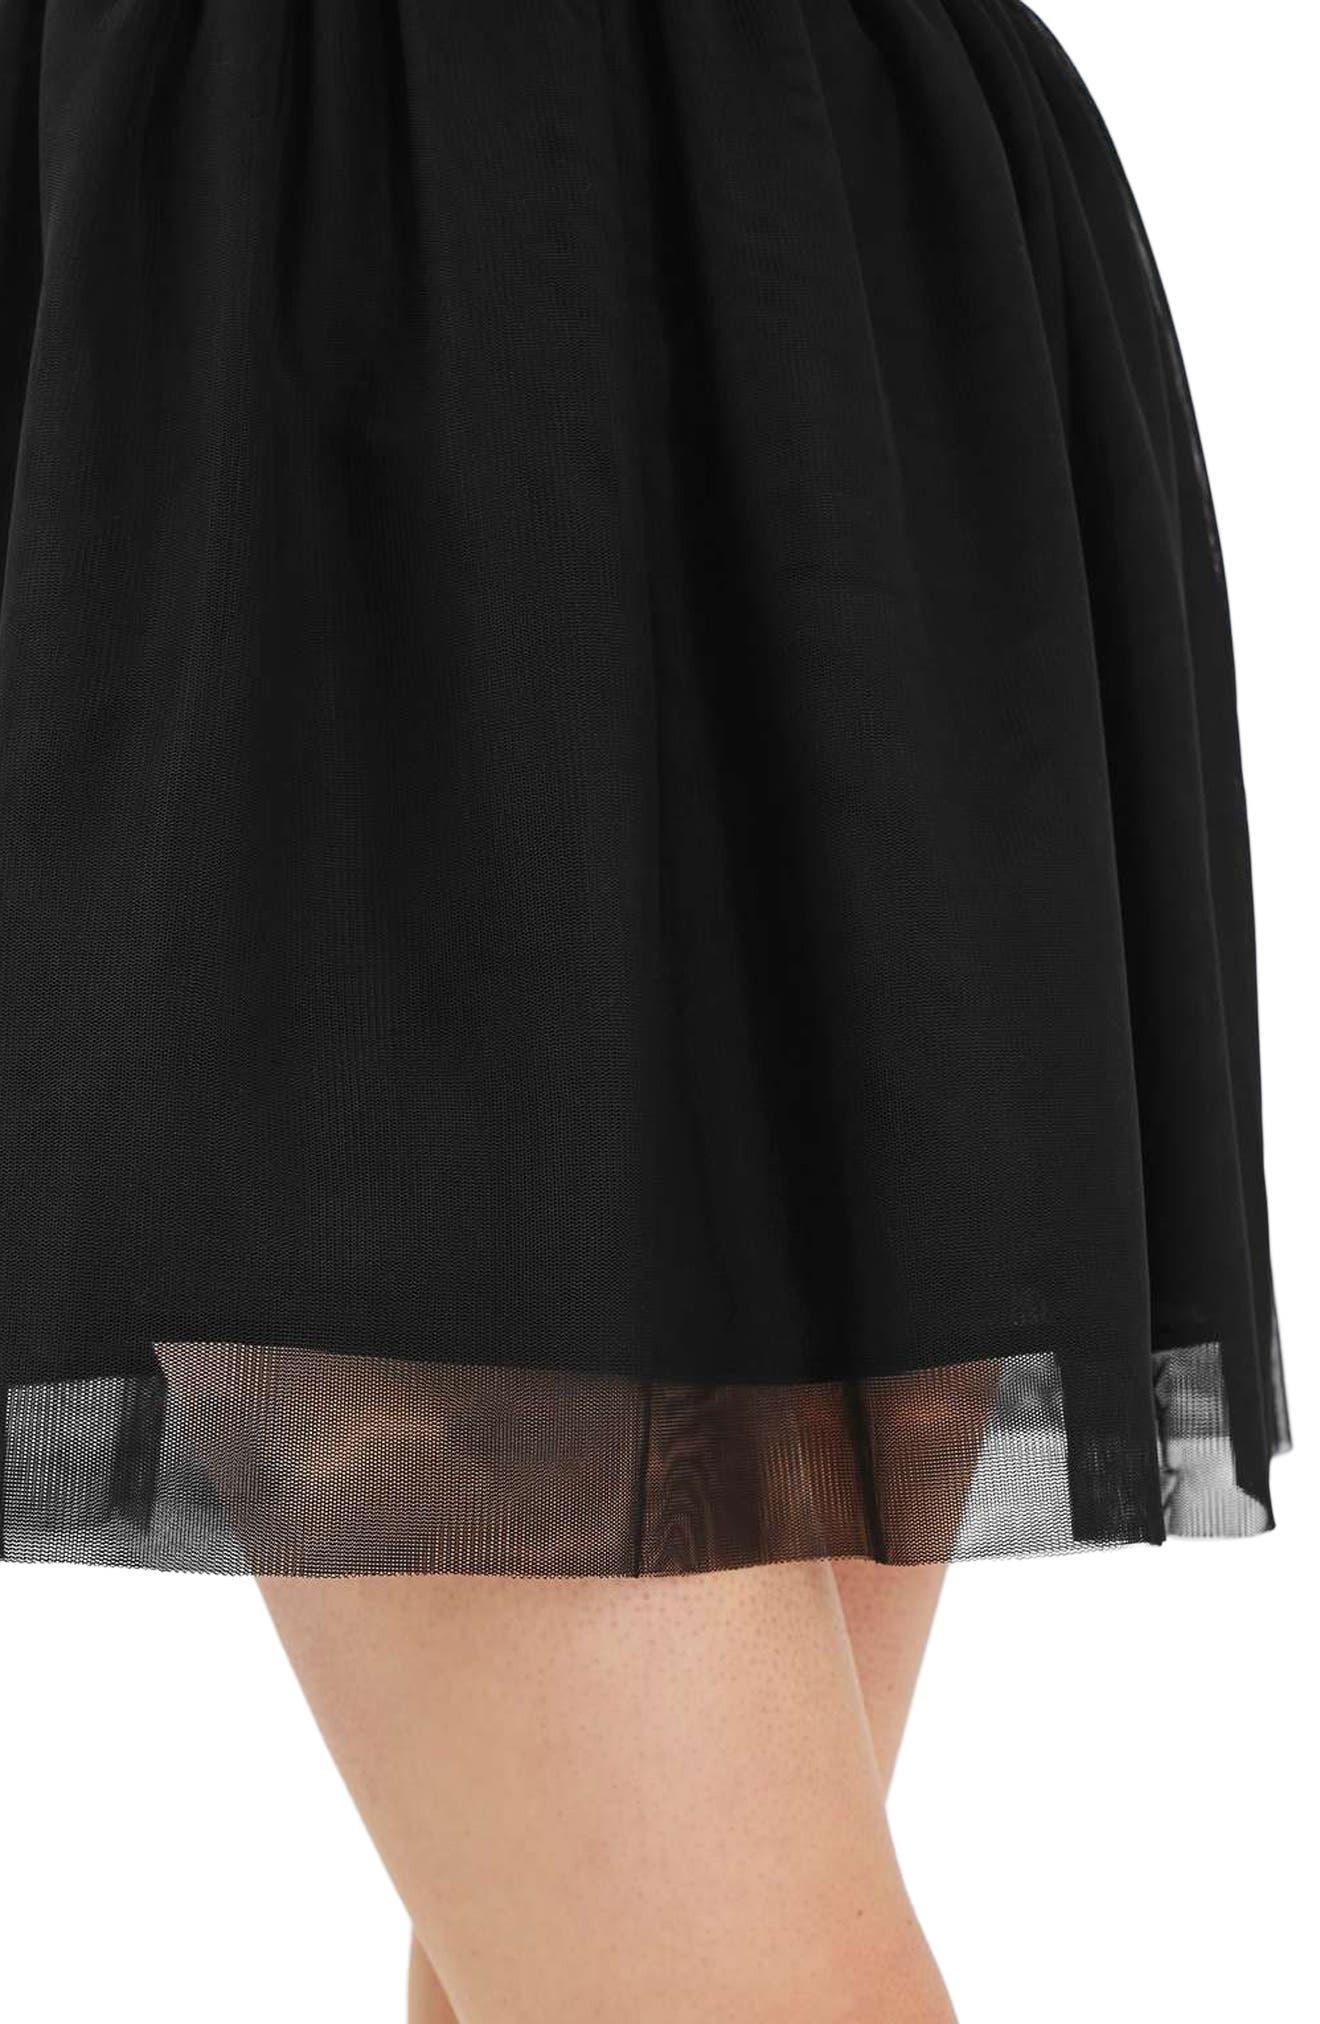 TOPSHOP, Tulle Miniskirt, Alternate thumbnail 3, color, 001